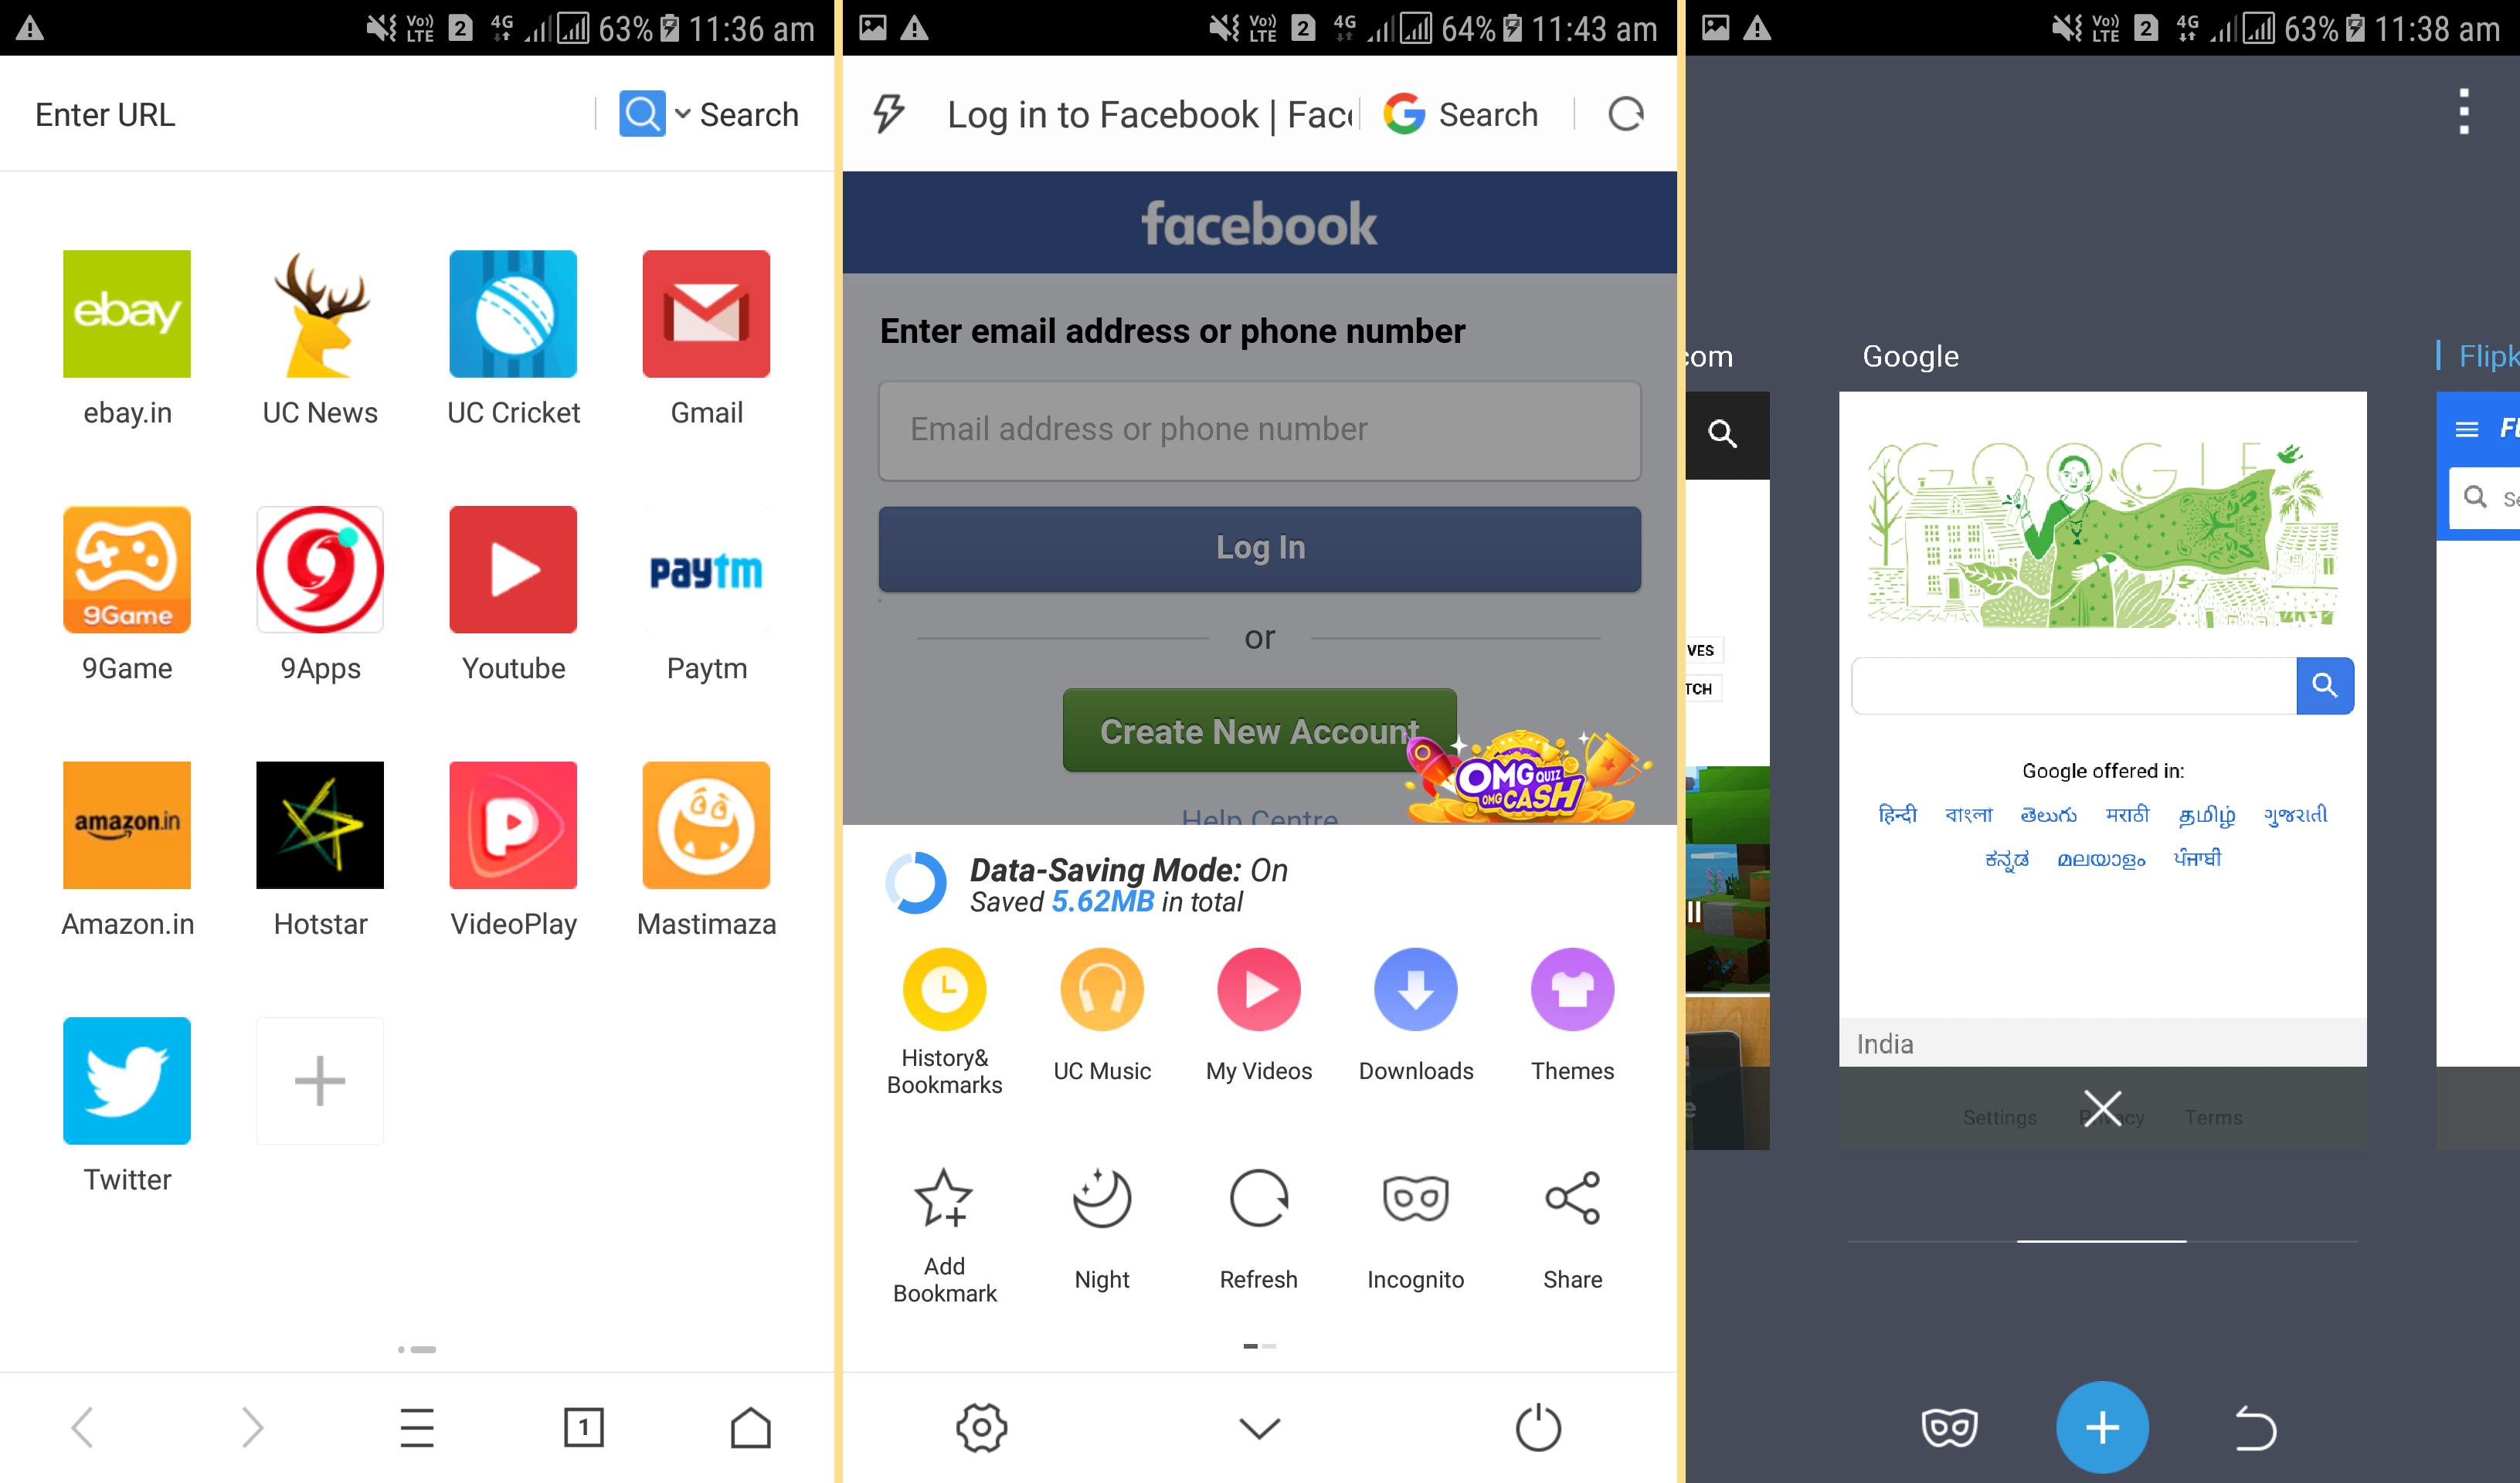 uc mini apps download 2018